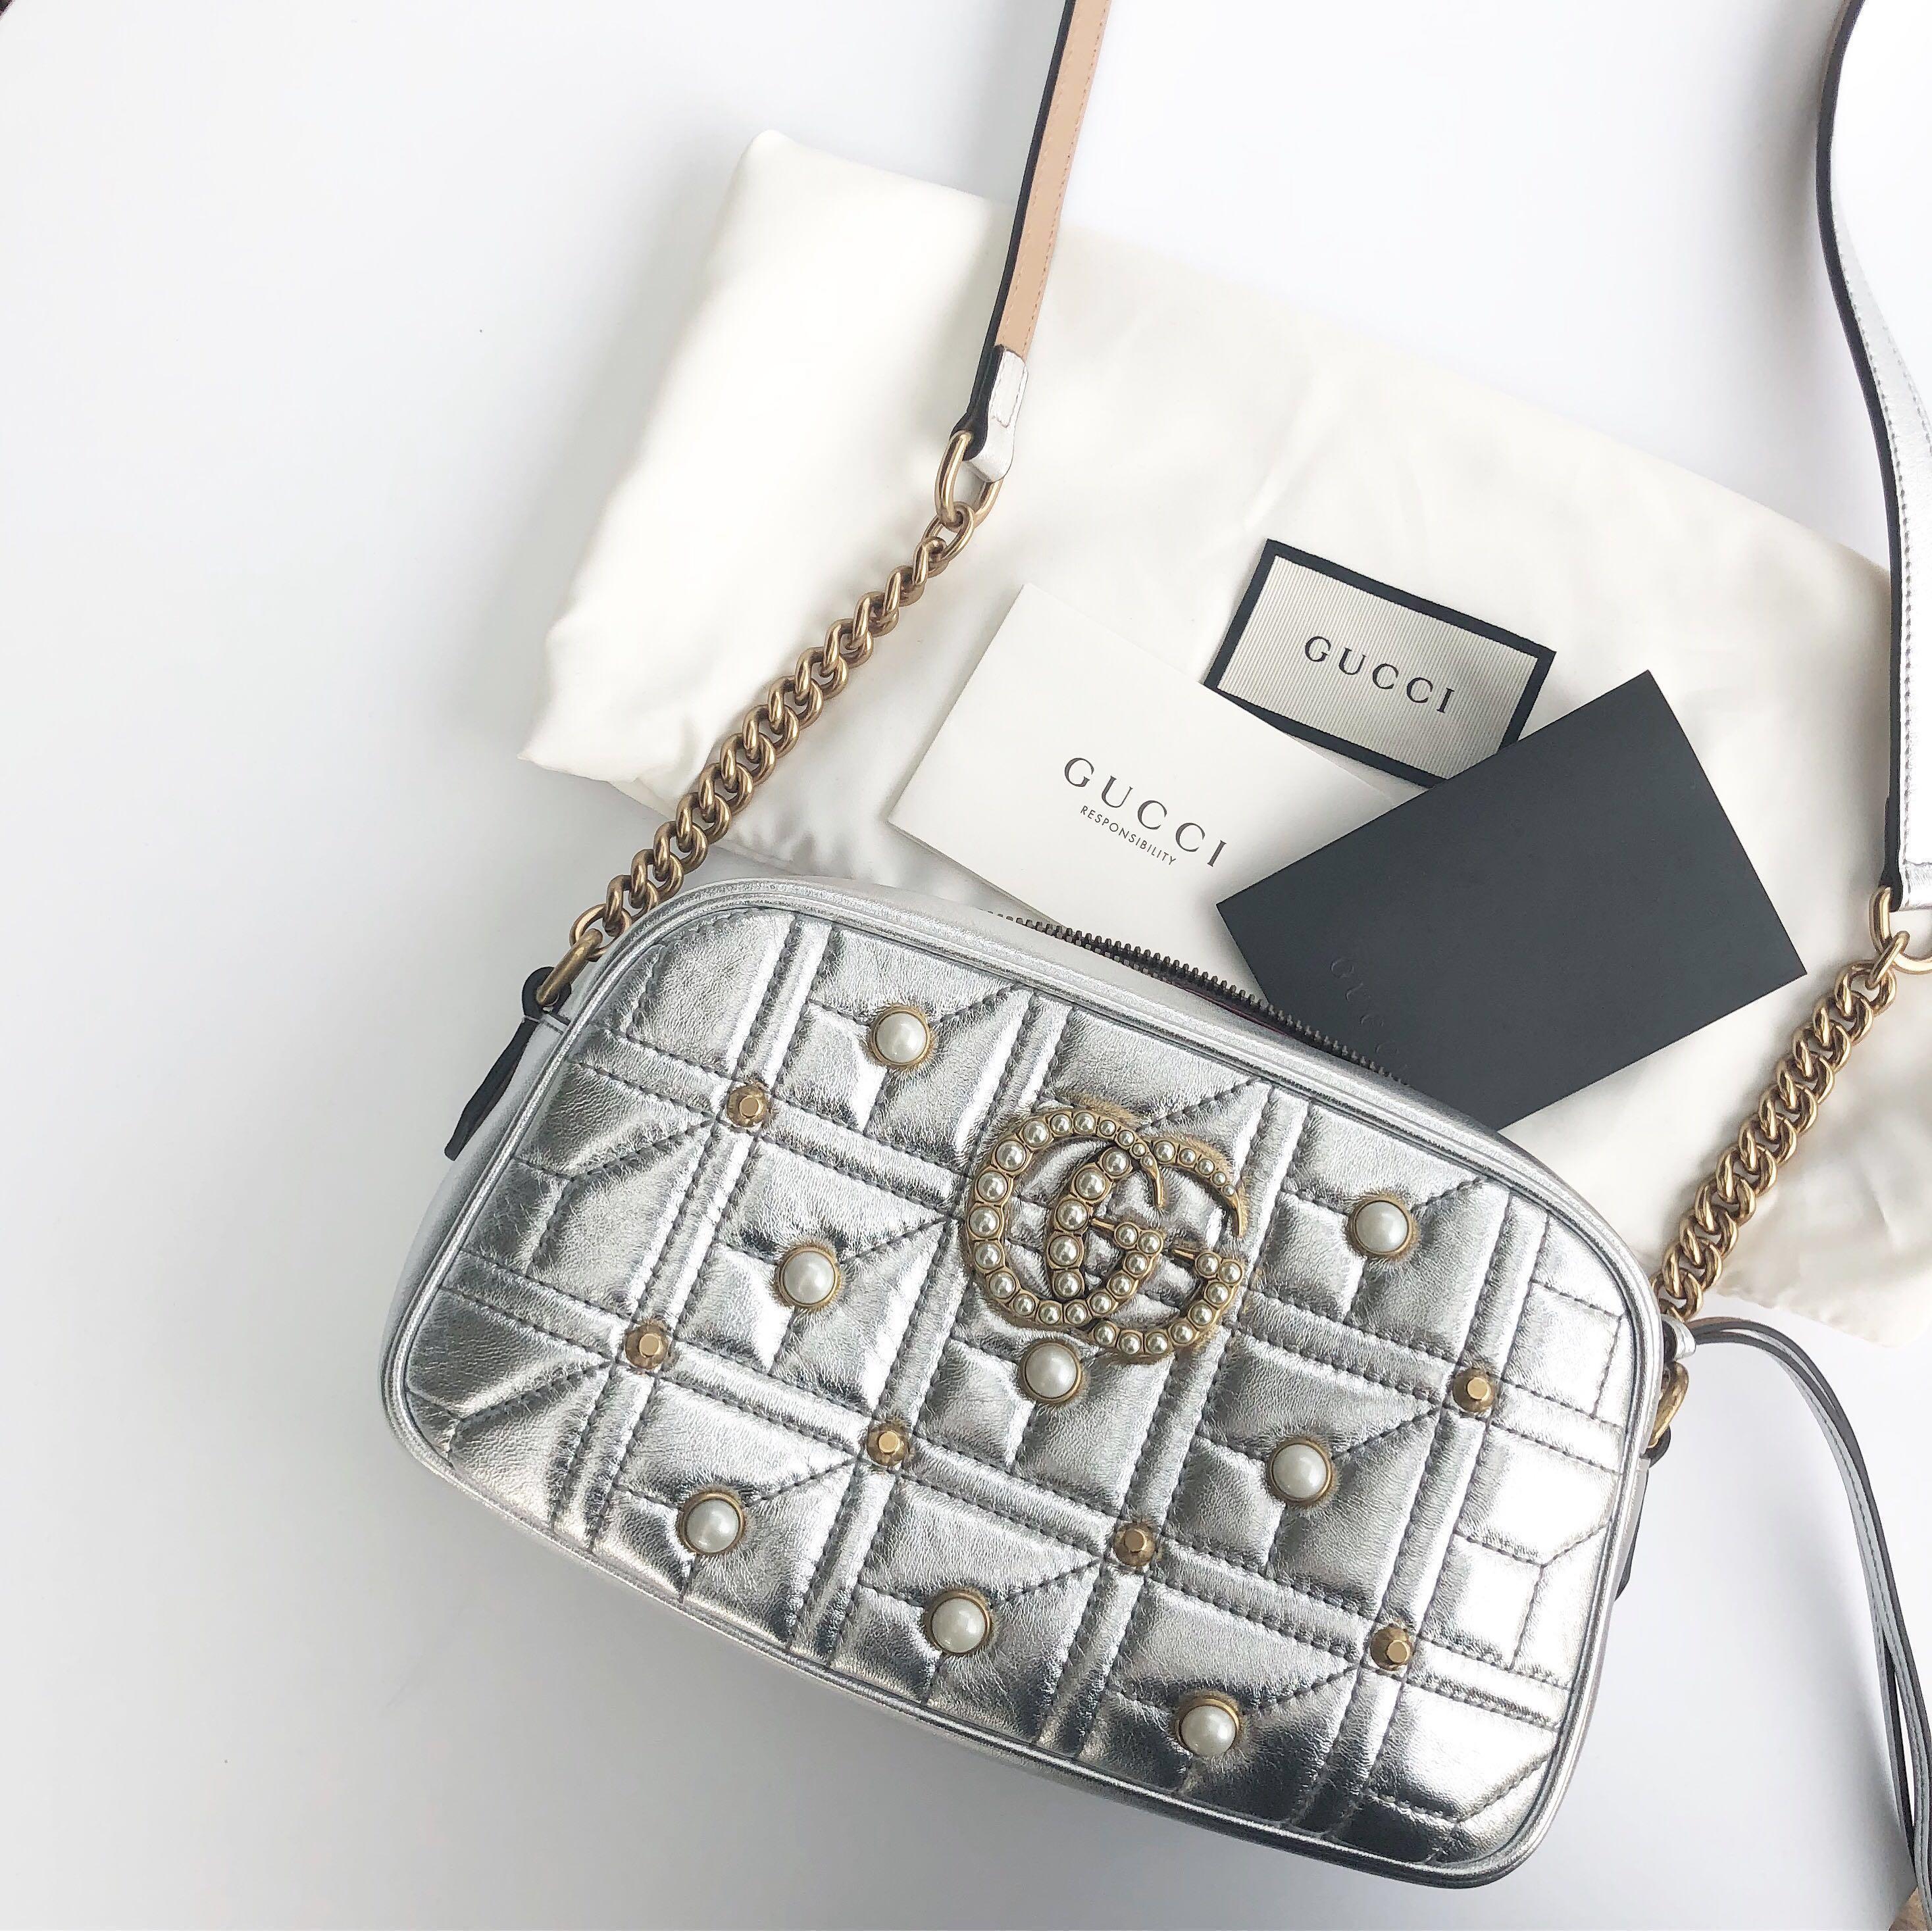 40c769bf8ee Gucci GG Marmont Pearl Matelasse Shoulder Bag Silver Metallic ...